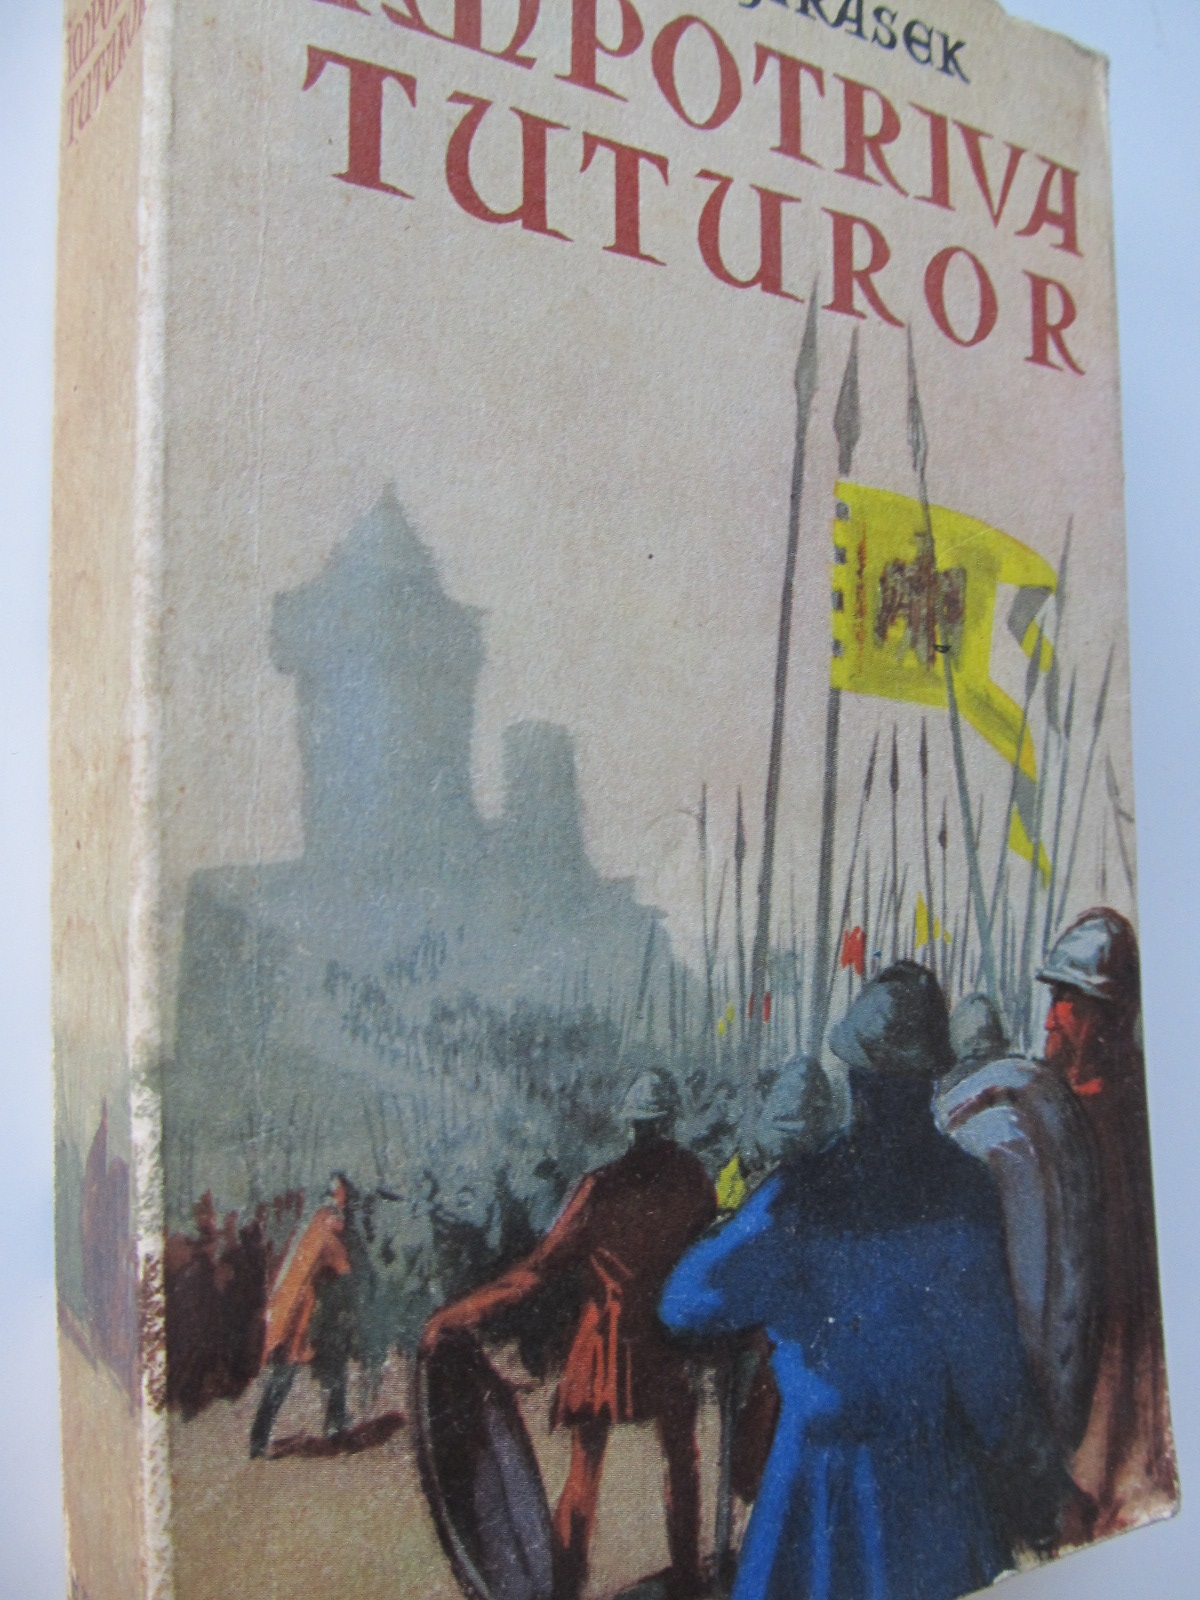 Impotriva tuturor - Alois Jirasek | Detalii carte